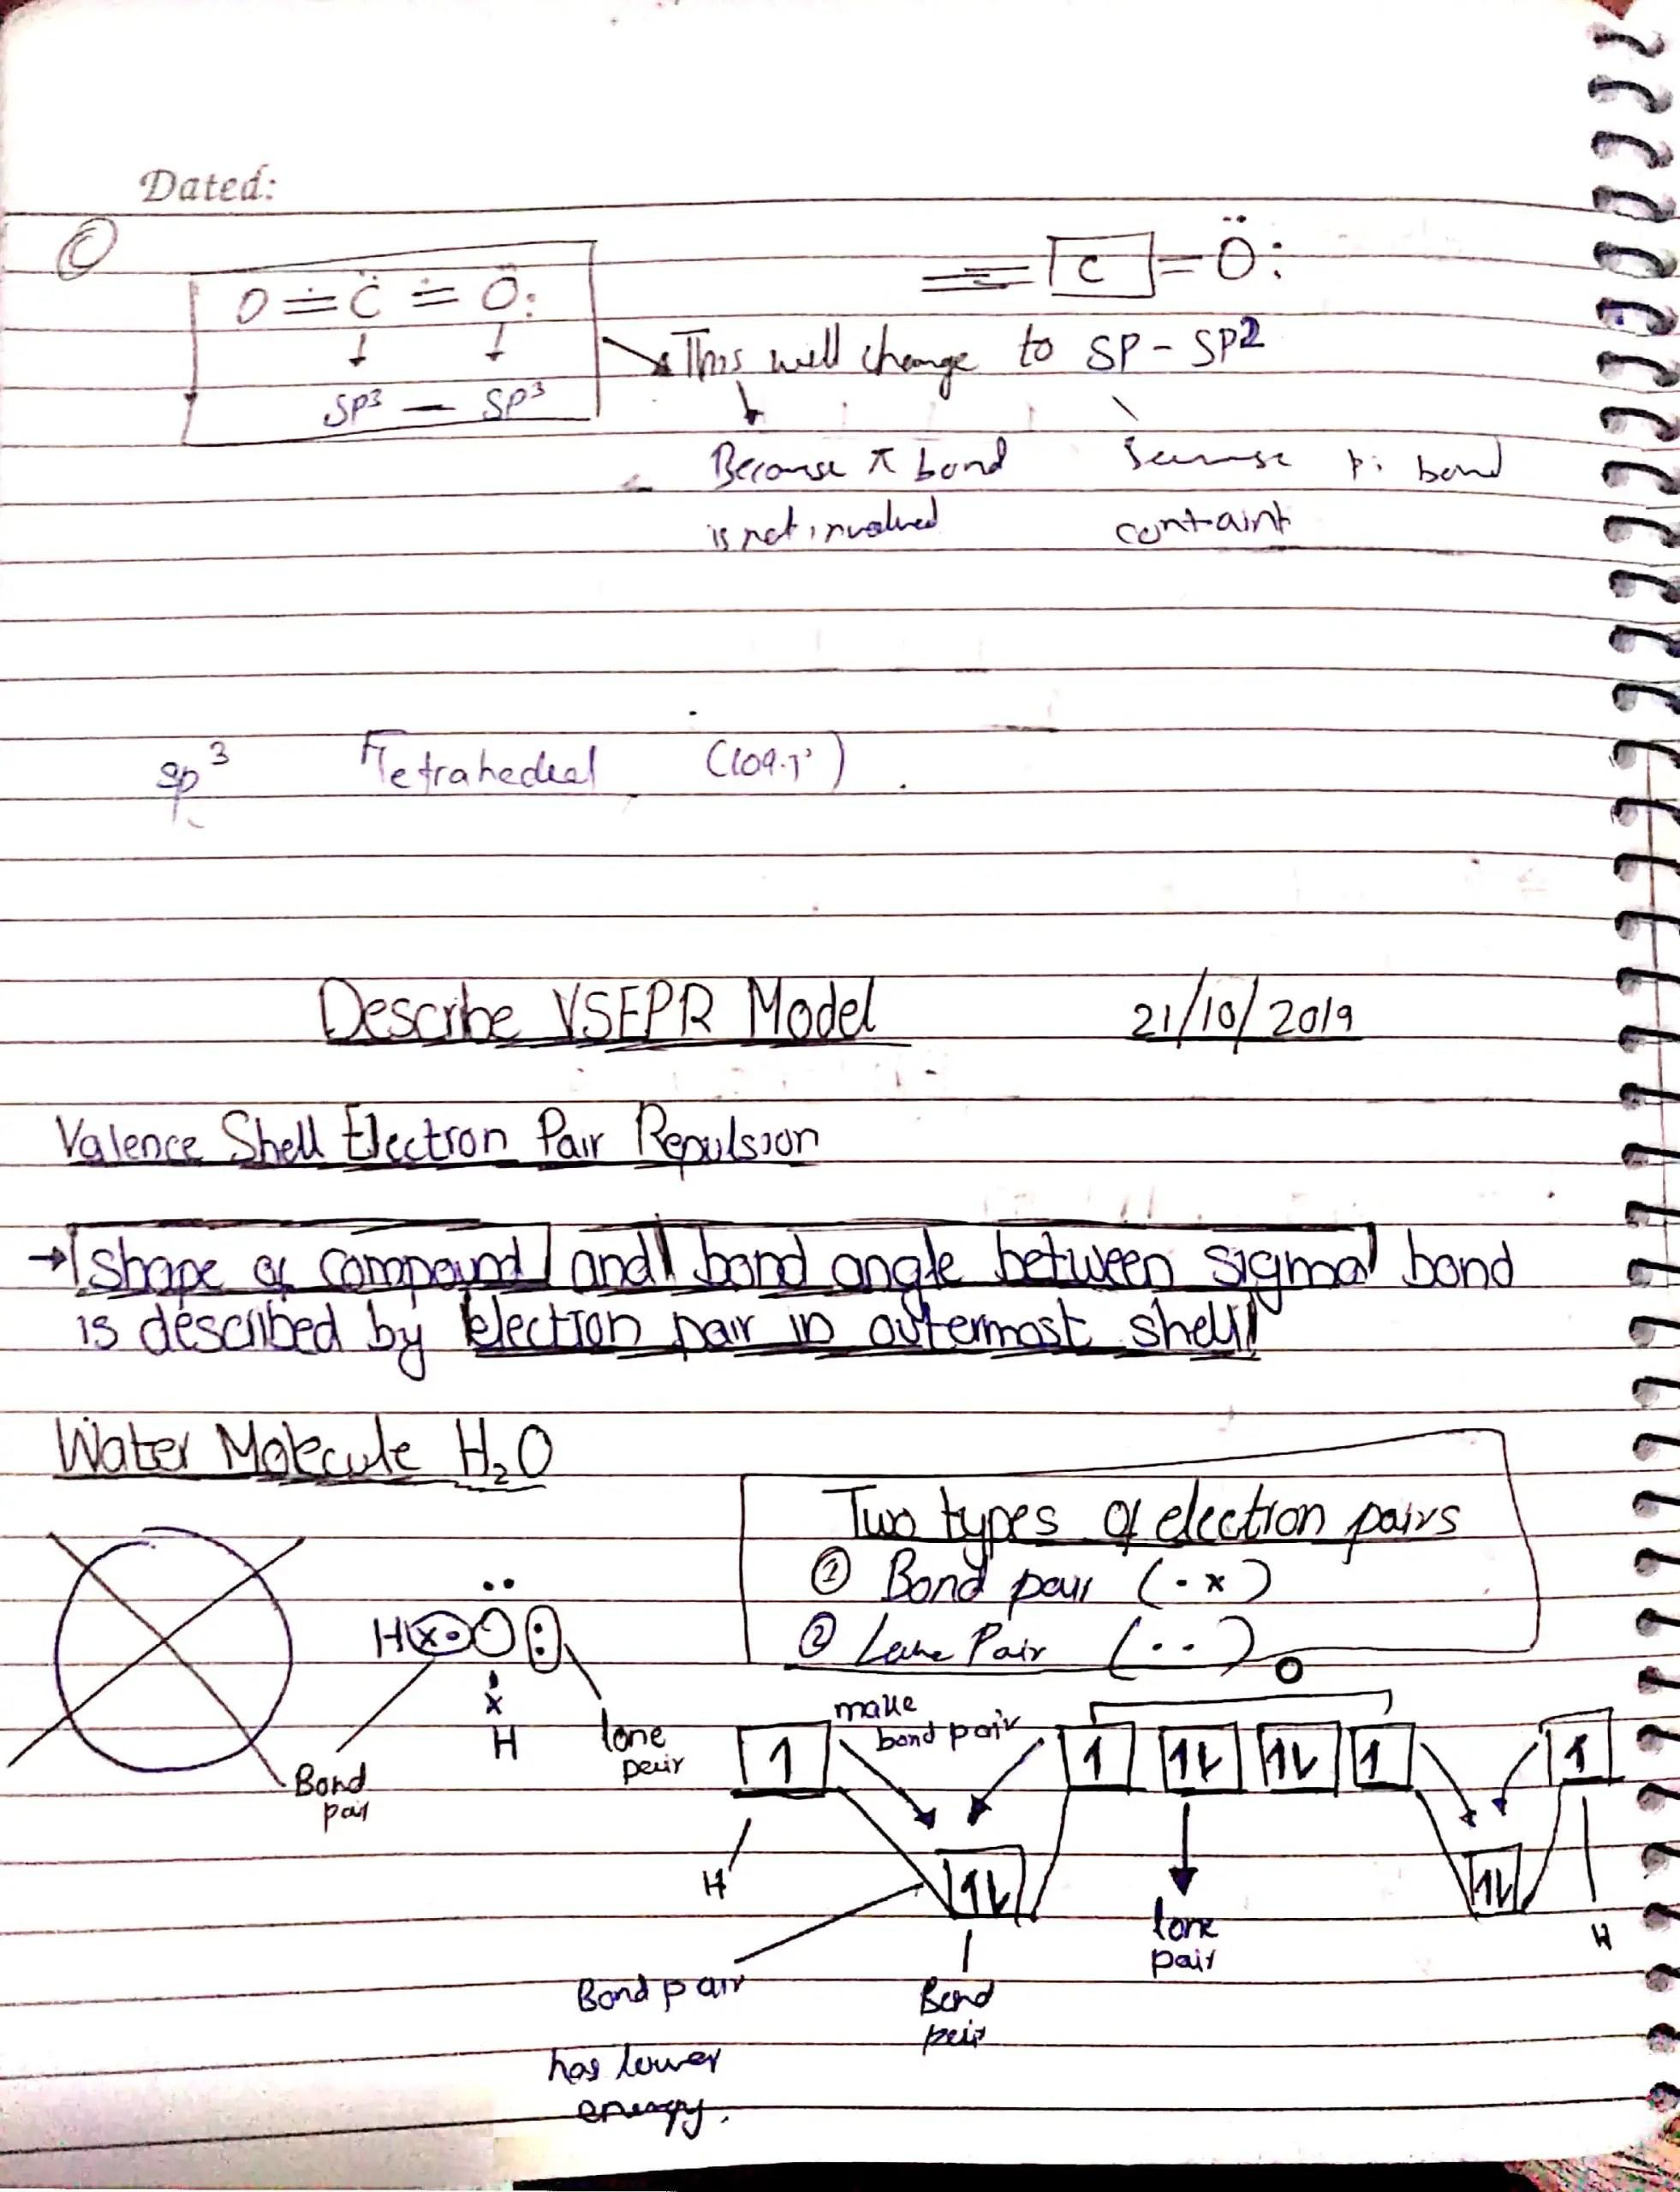 chemical bonding Sir Kashif_25